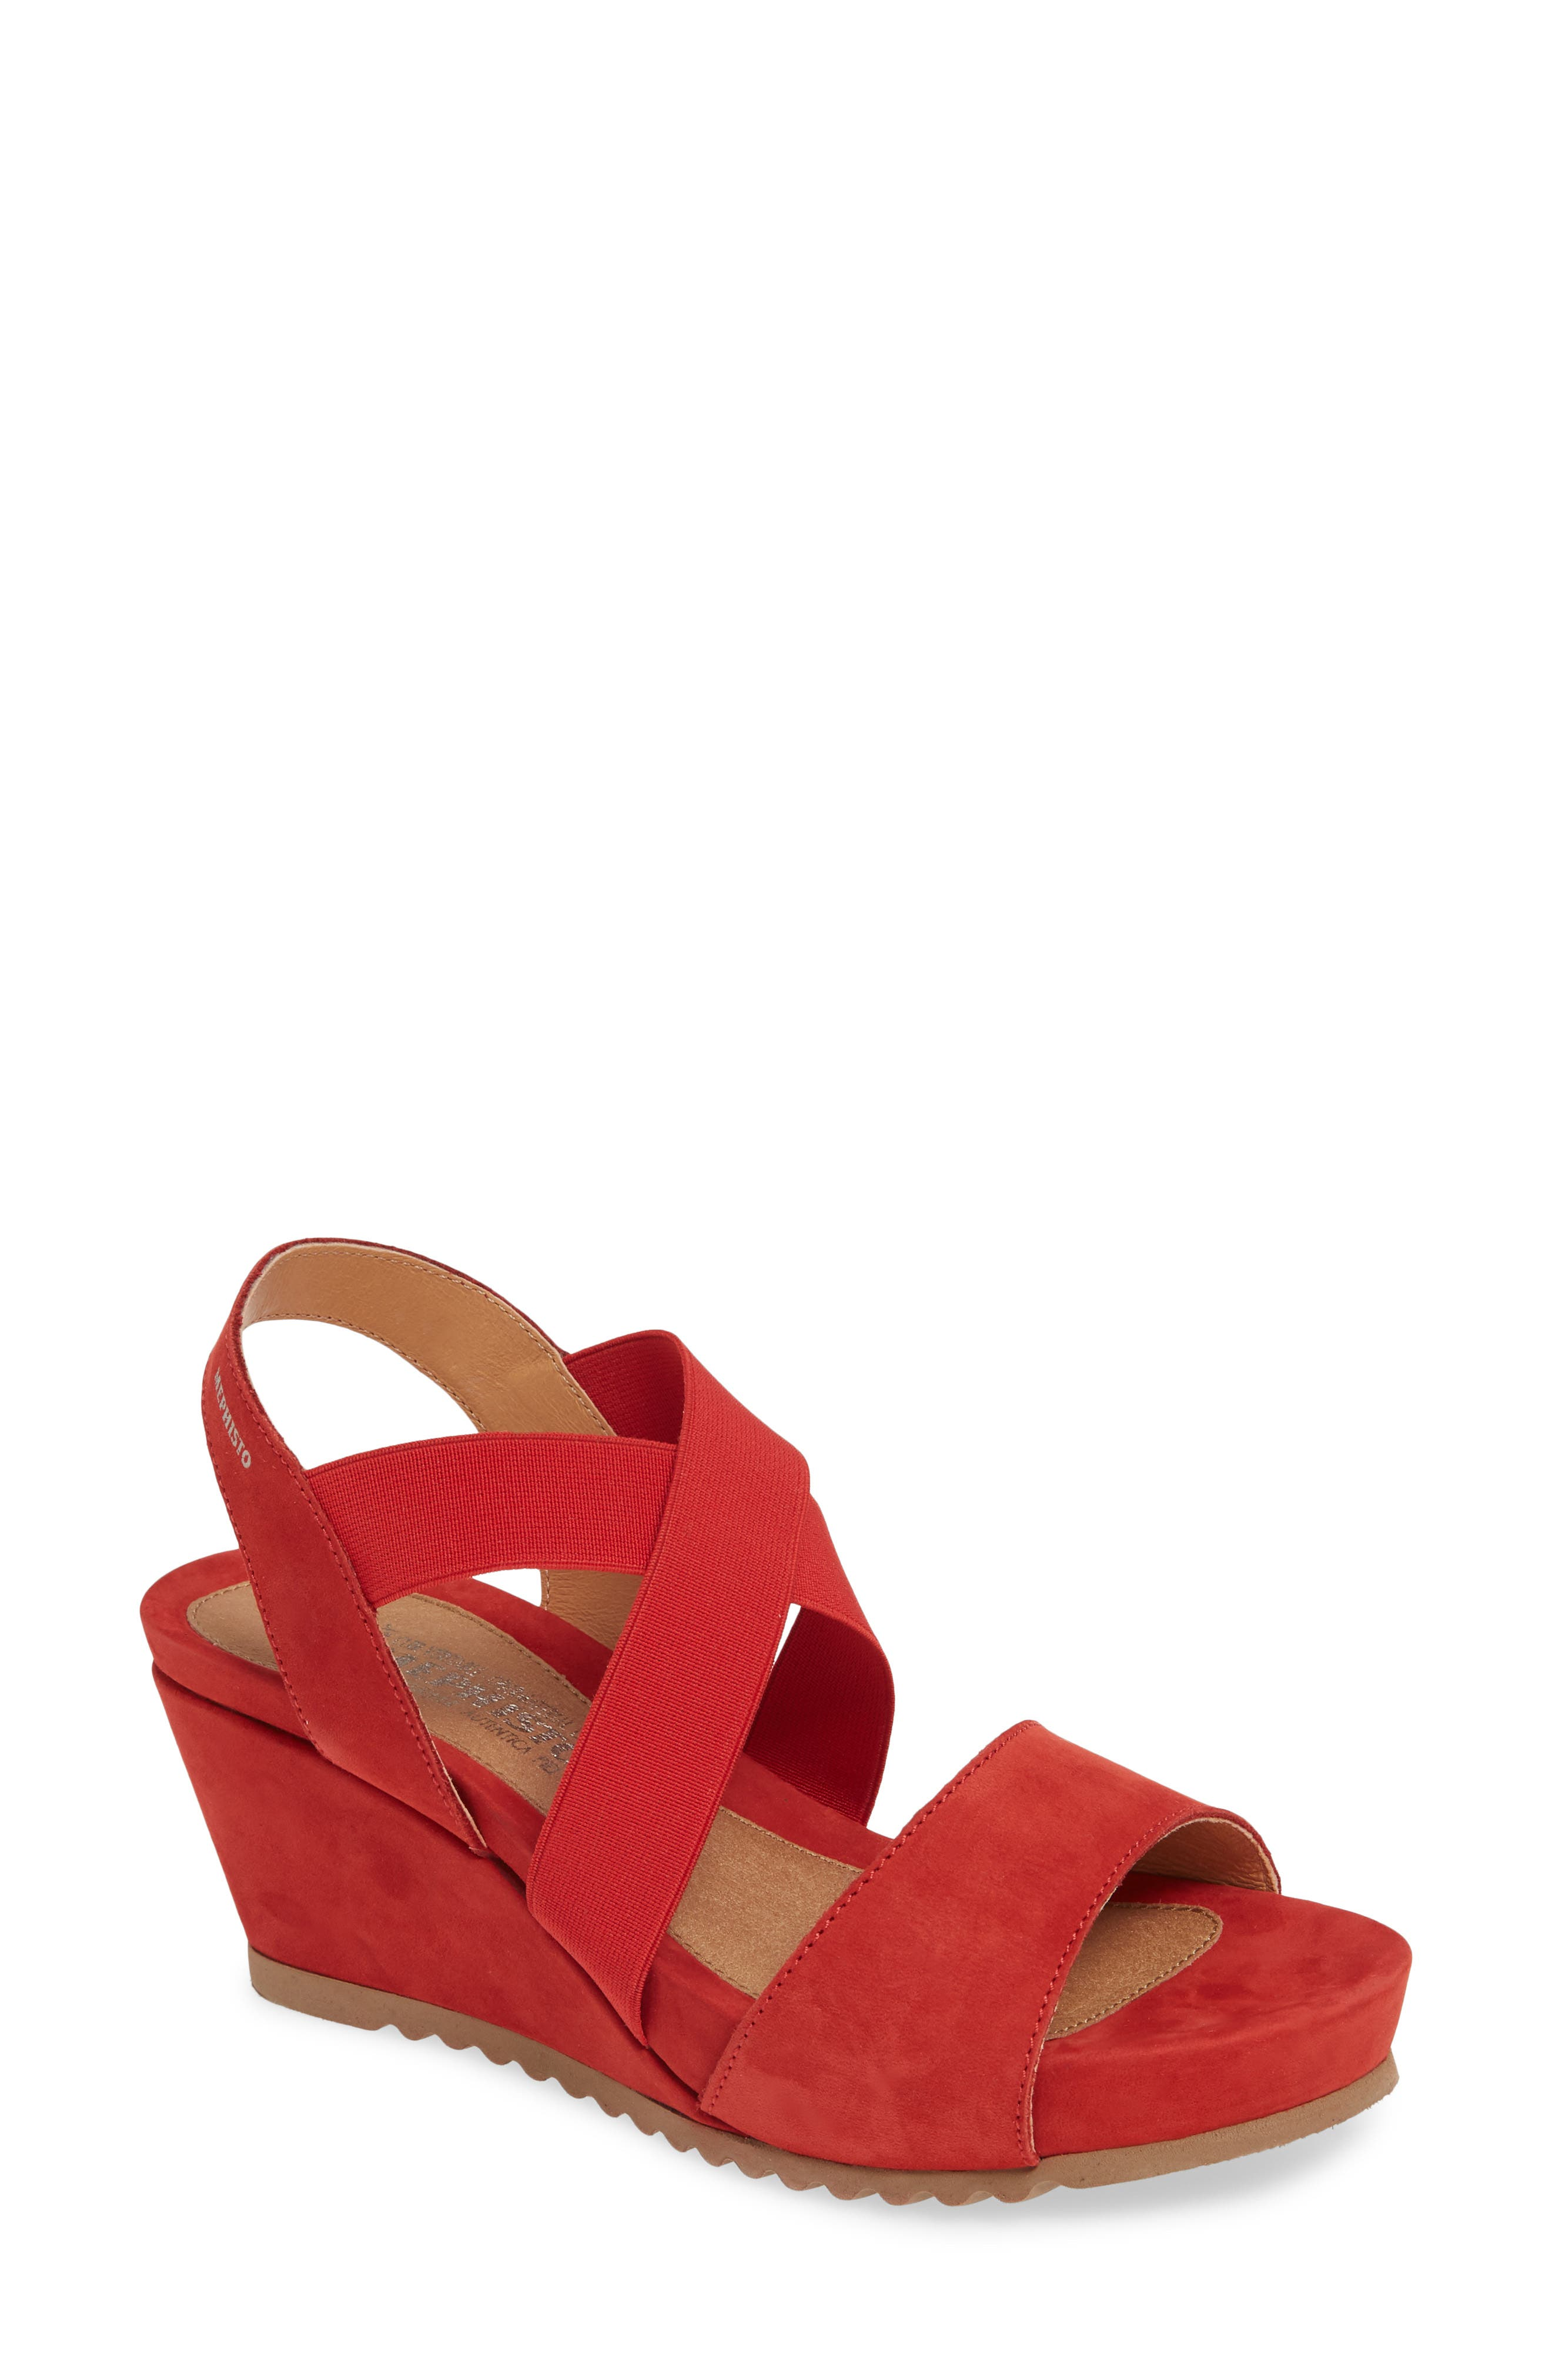 Mephisto Giuliana Wedge Sandal, Red